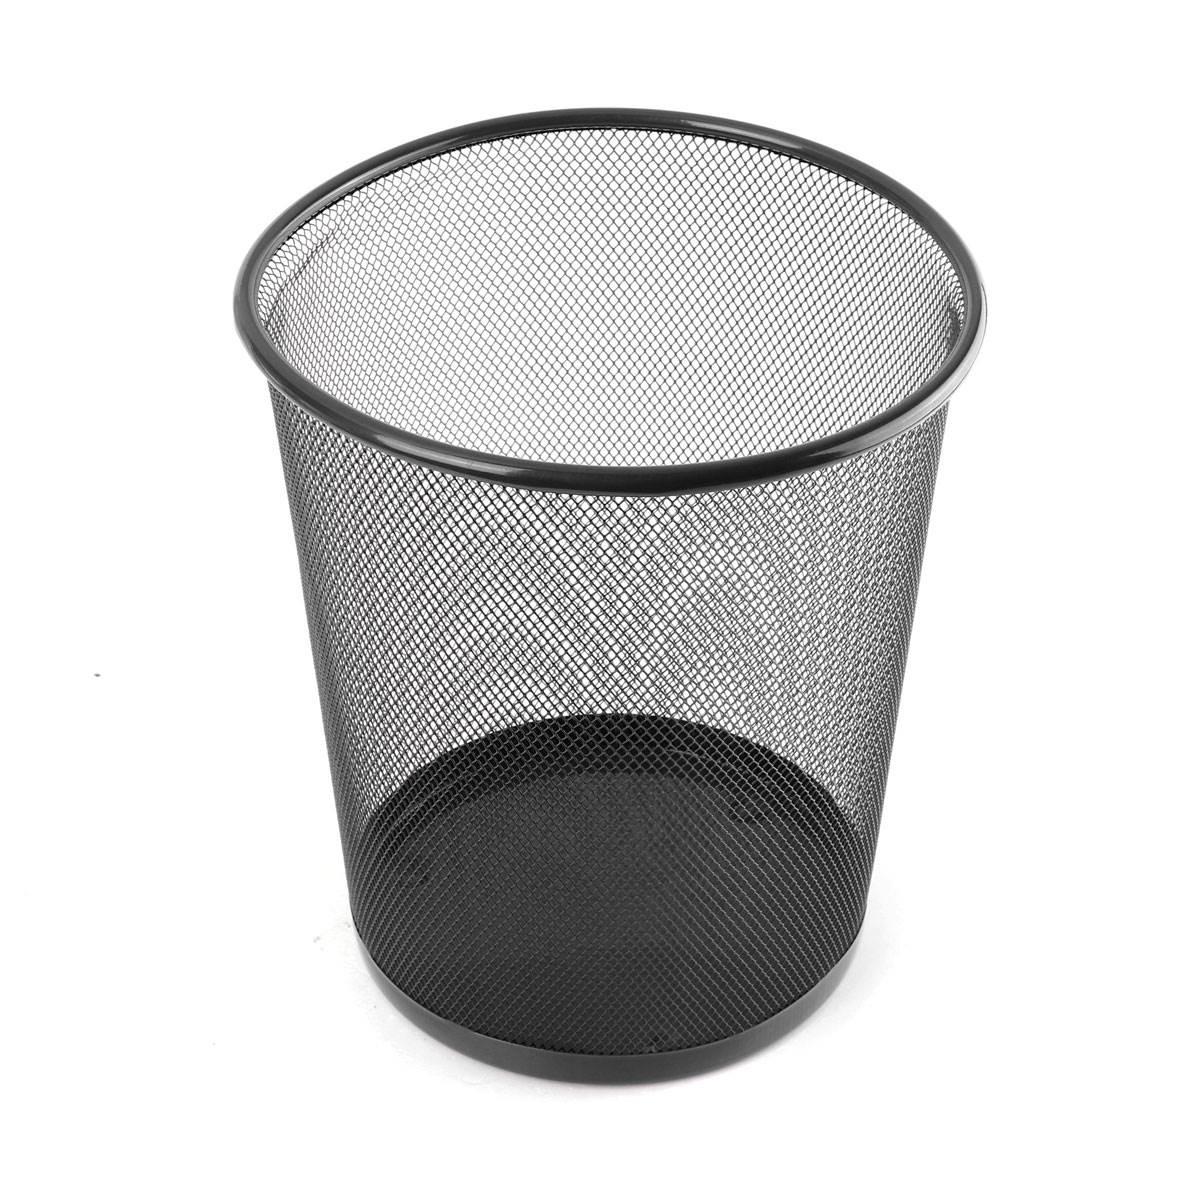 Wastepaper Basket Online Get Cheap Metal Waste Basket Aliexpress  Alibaba Group